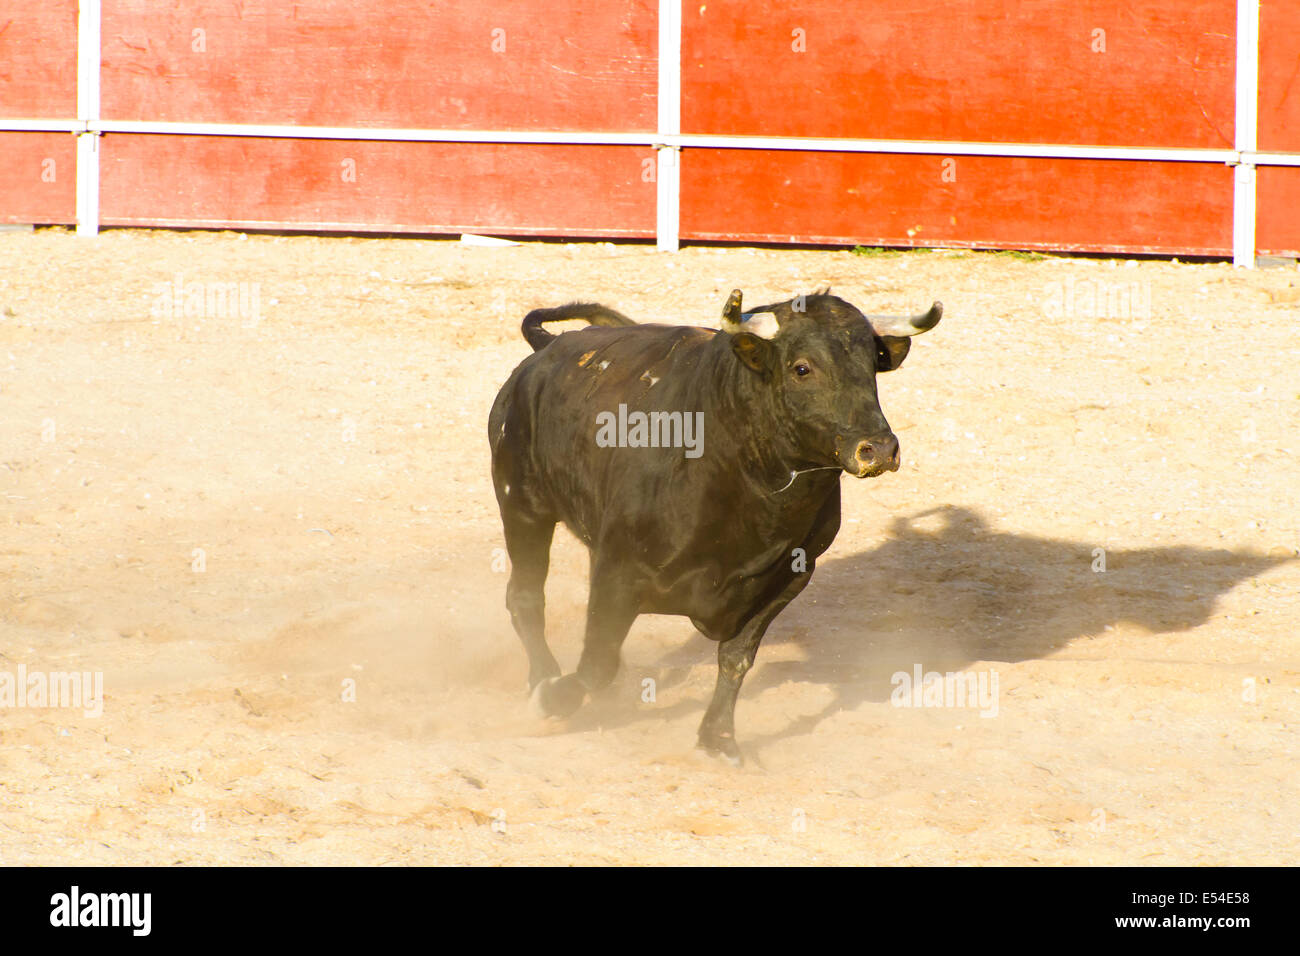 Spanish Bull Bullfight Animal Of Great Strength And Nobility